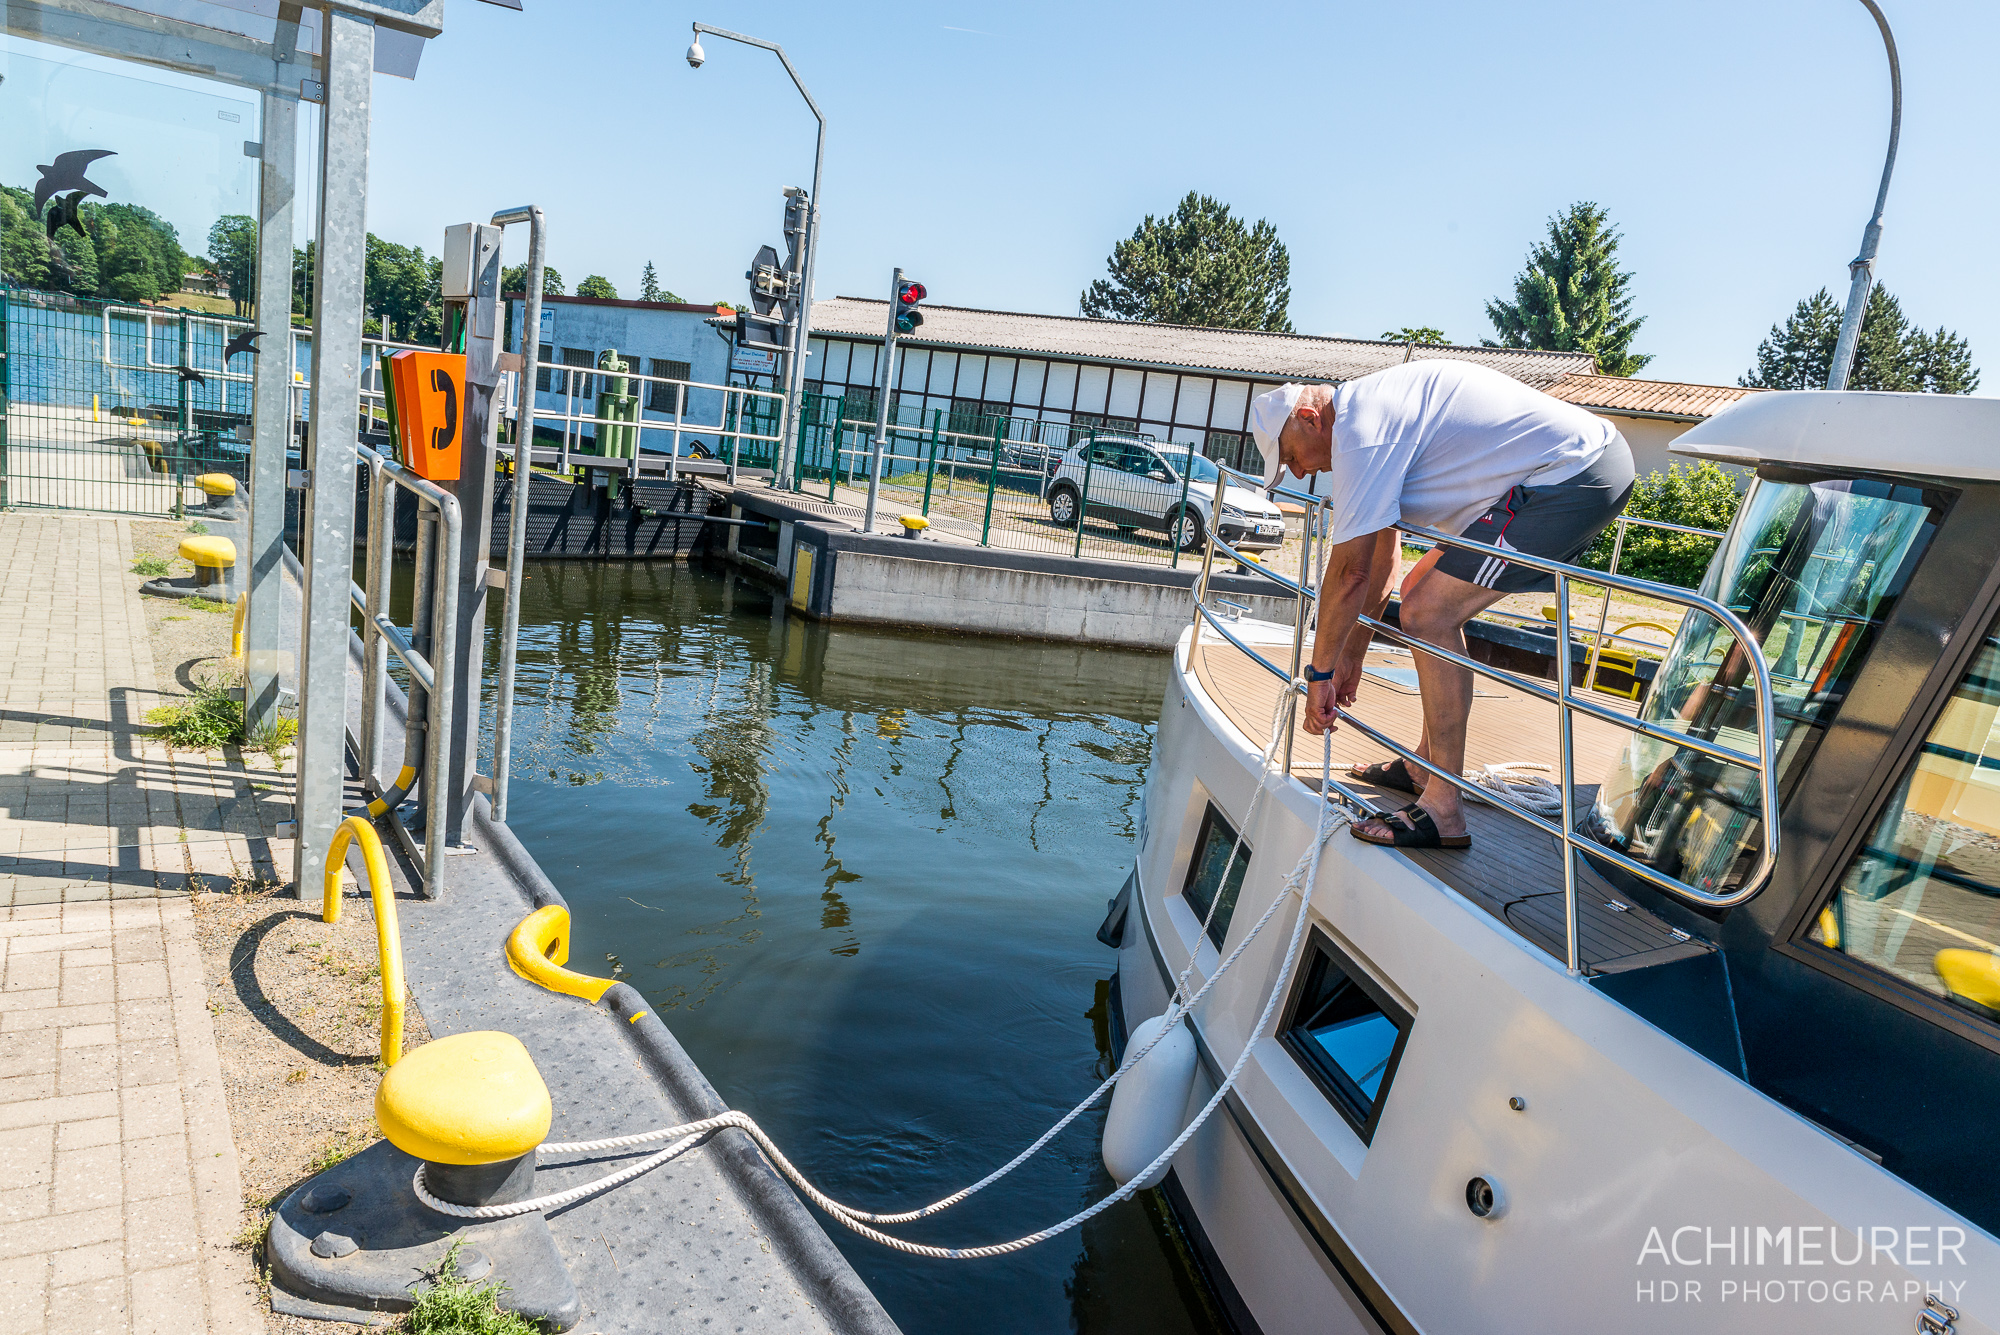 Hausboot-Kuhnle-Mueritz-Mecklenburg-Vorpommern-See_3192